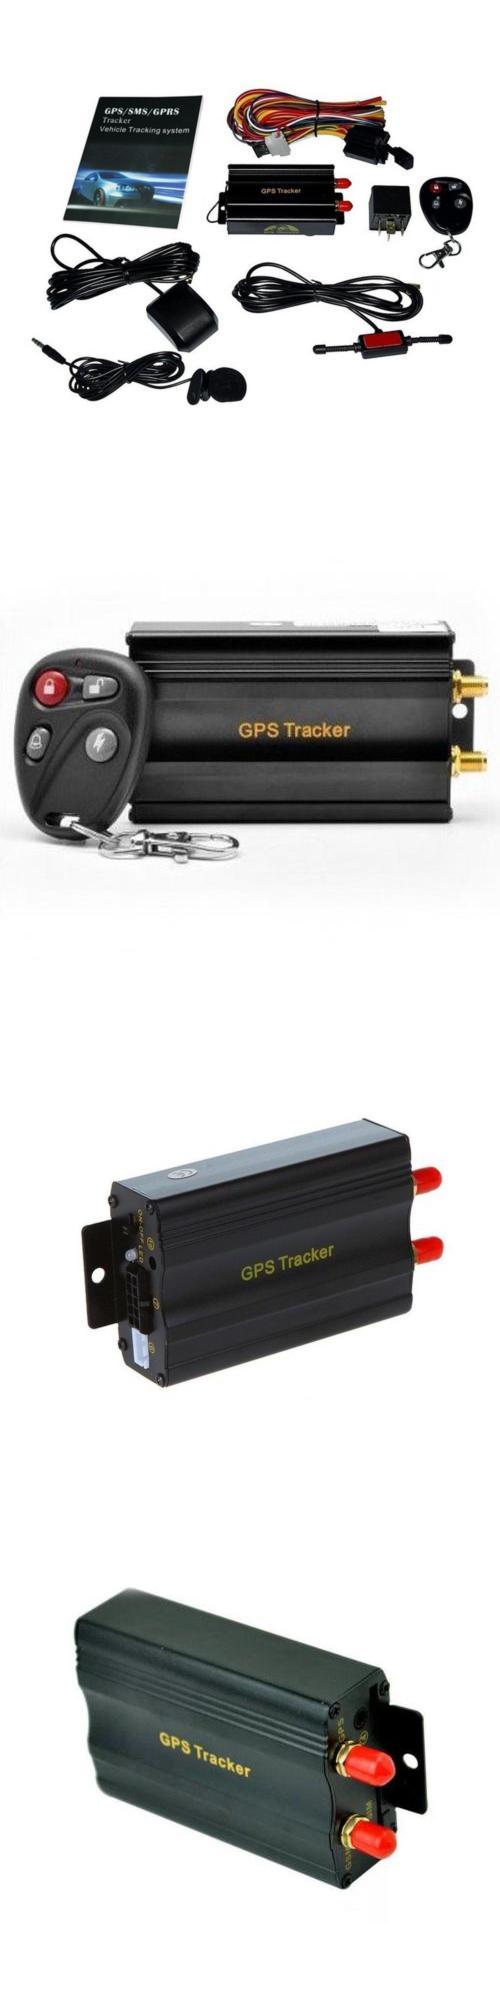 Tracking Devices: Redsun New Gps Sms Gprs Tracker Tk103b Vehicle